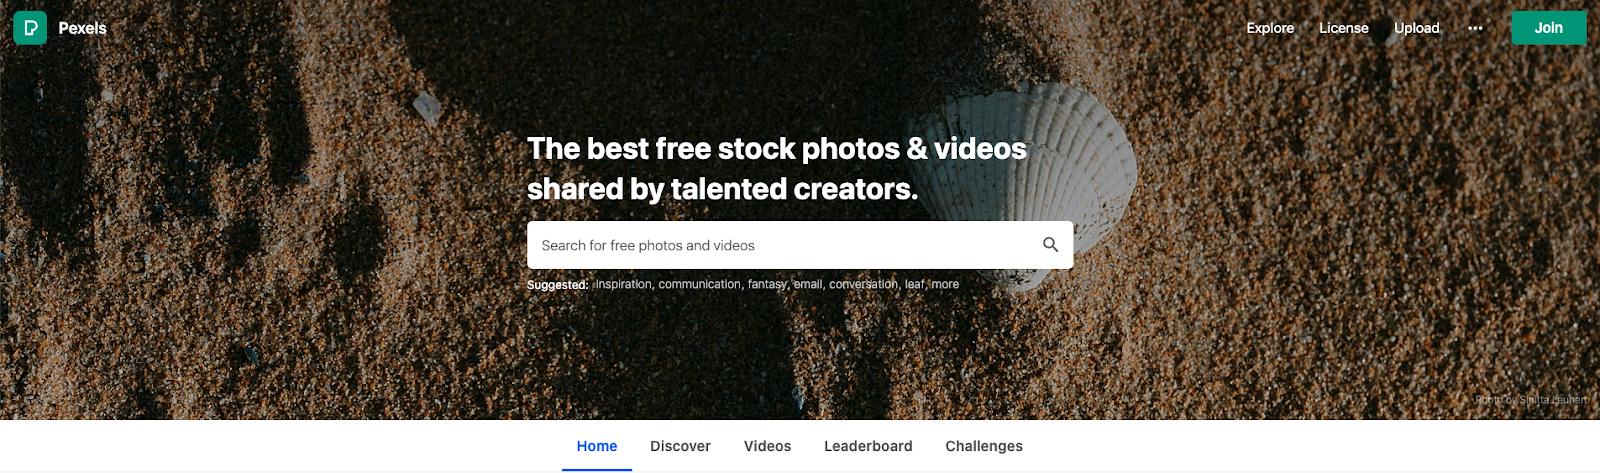 Pexels home page screen grab